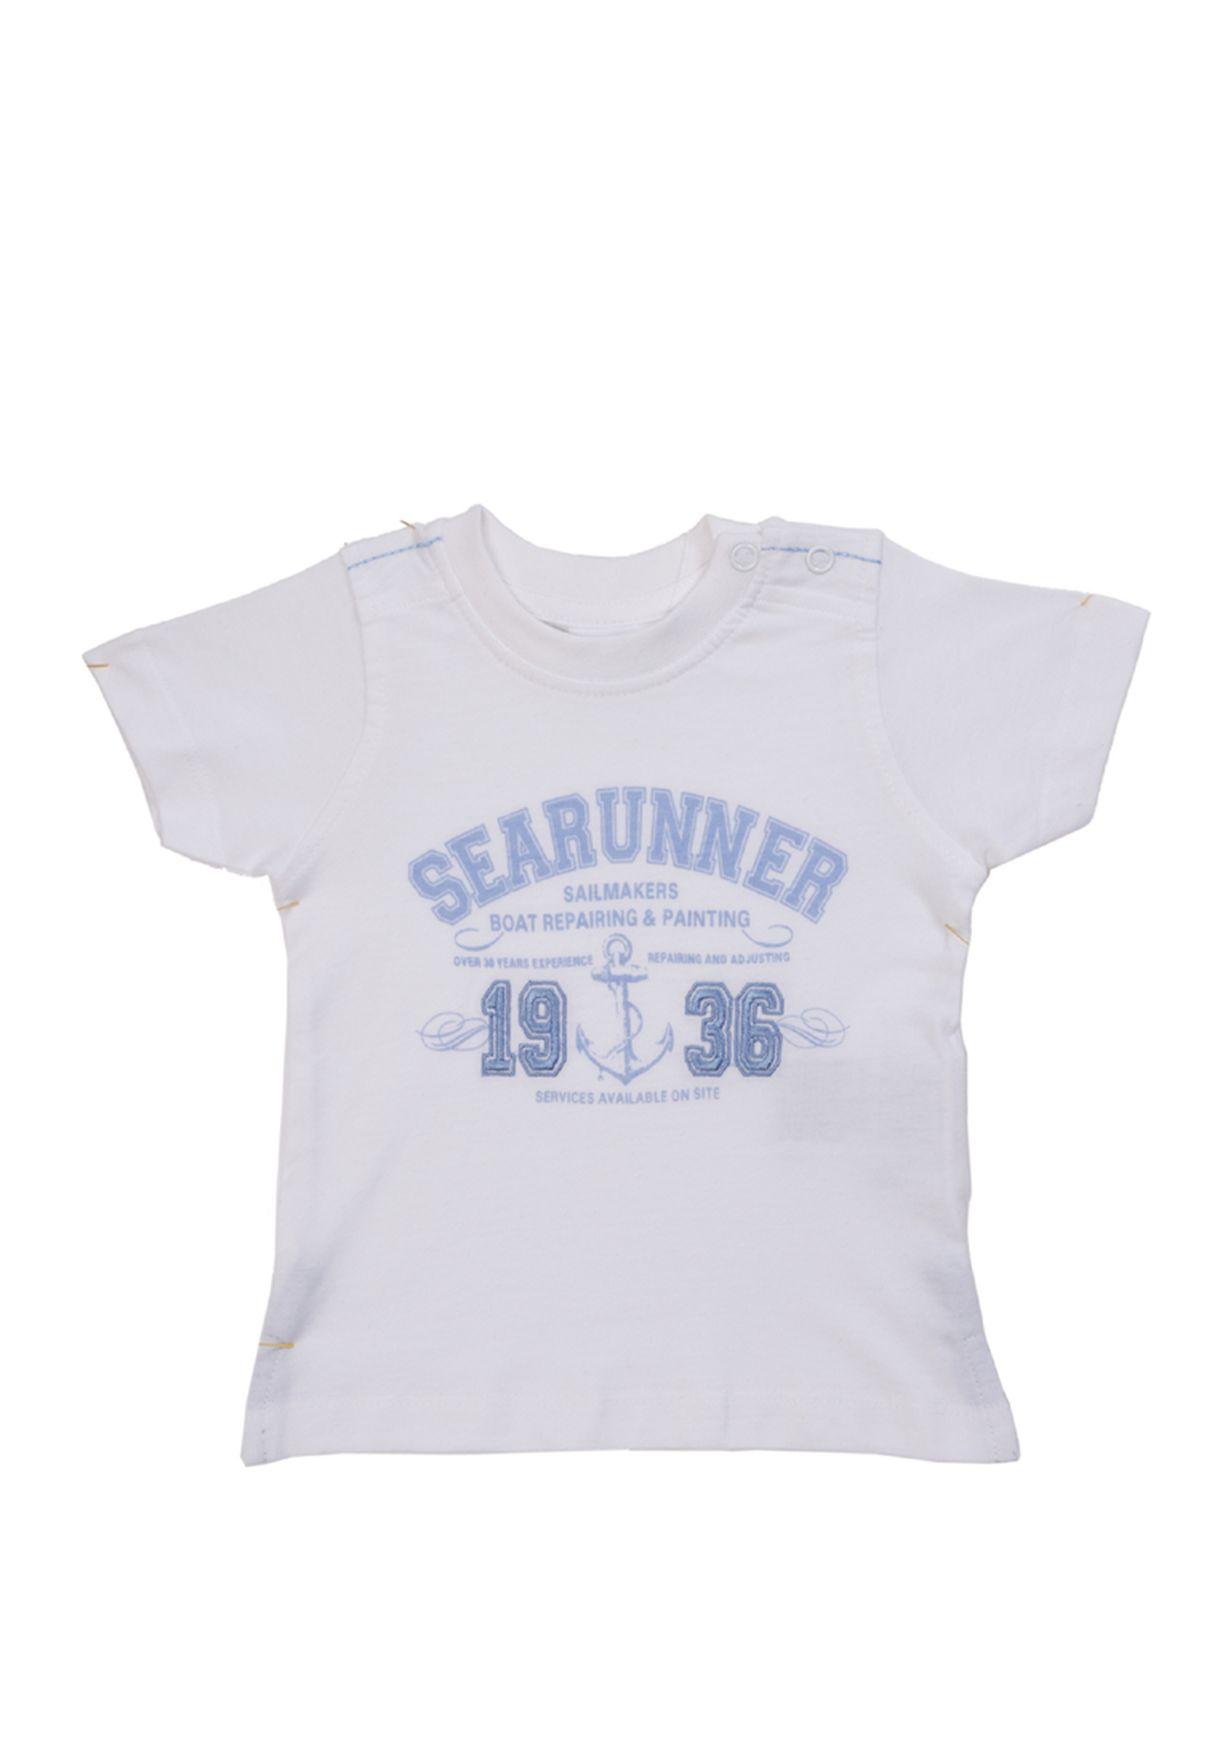 332dbef38 Shop Blue Seven white Short Sleeve Shirt for Kids in Qatar ...